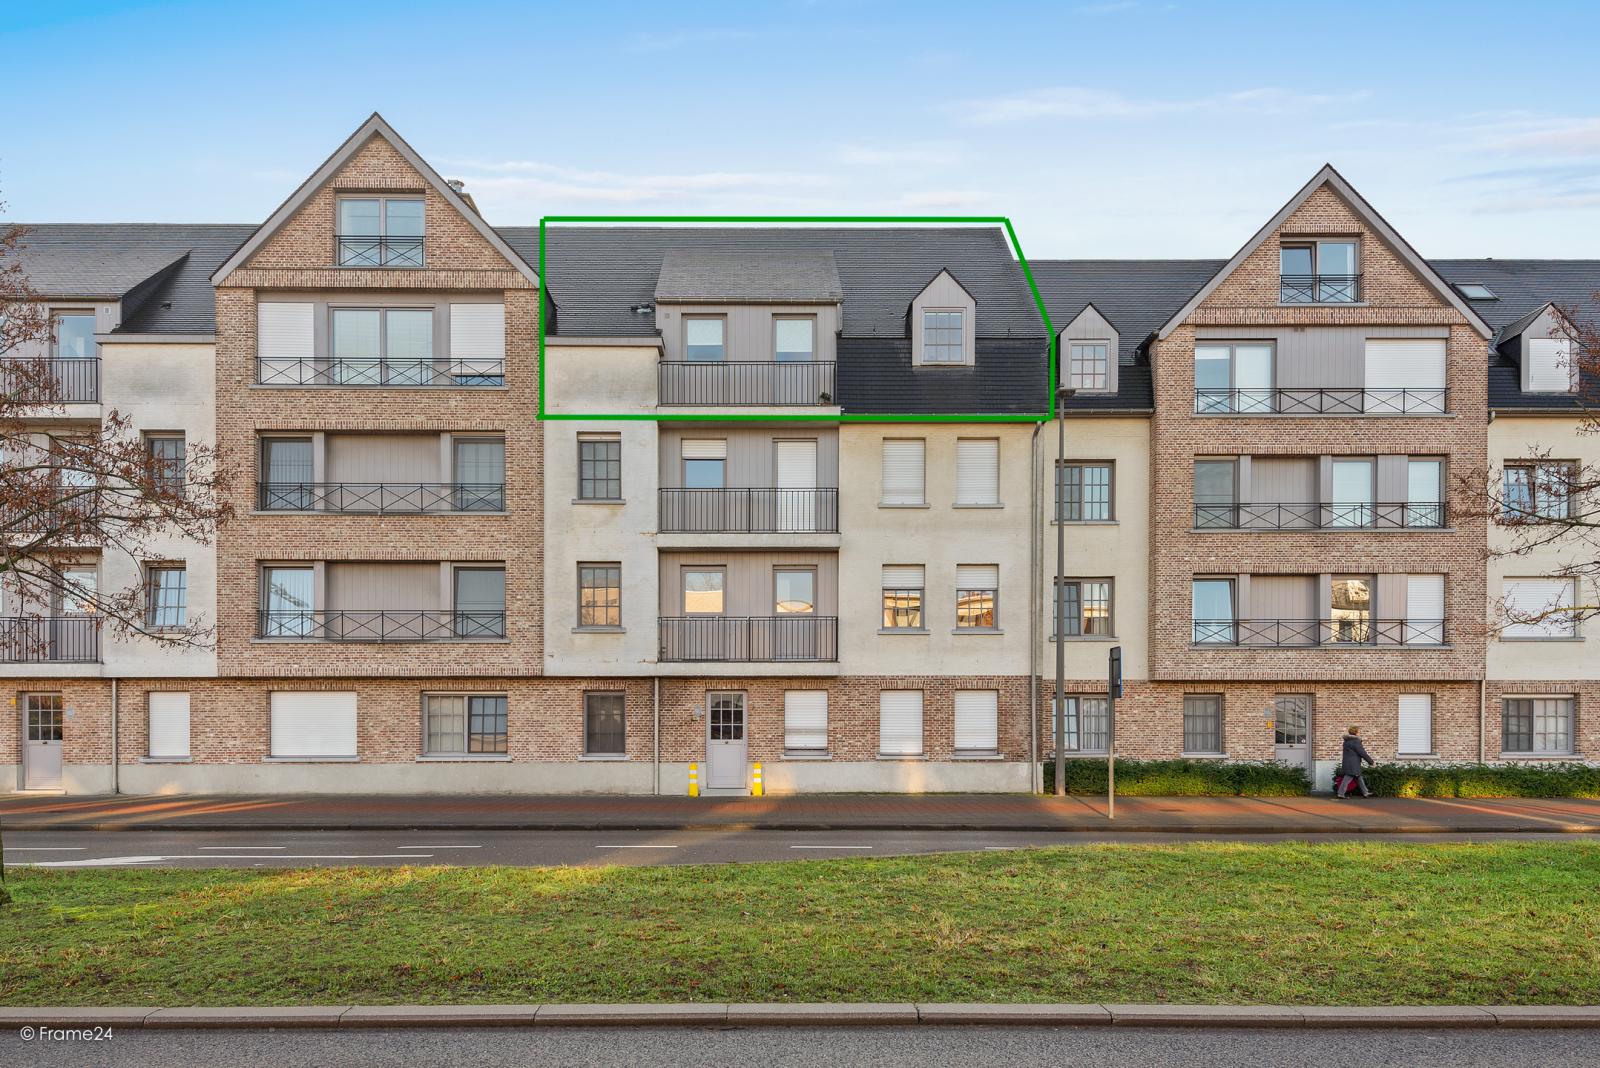 Riant dakappartement (130 m²) met zonnig terras in residentie 'Eyserhof' te Wijnegem! afbeelding 1